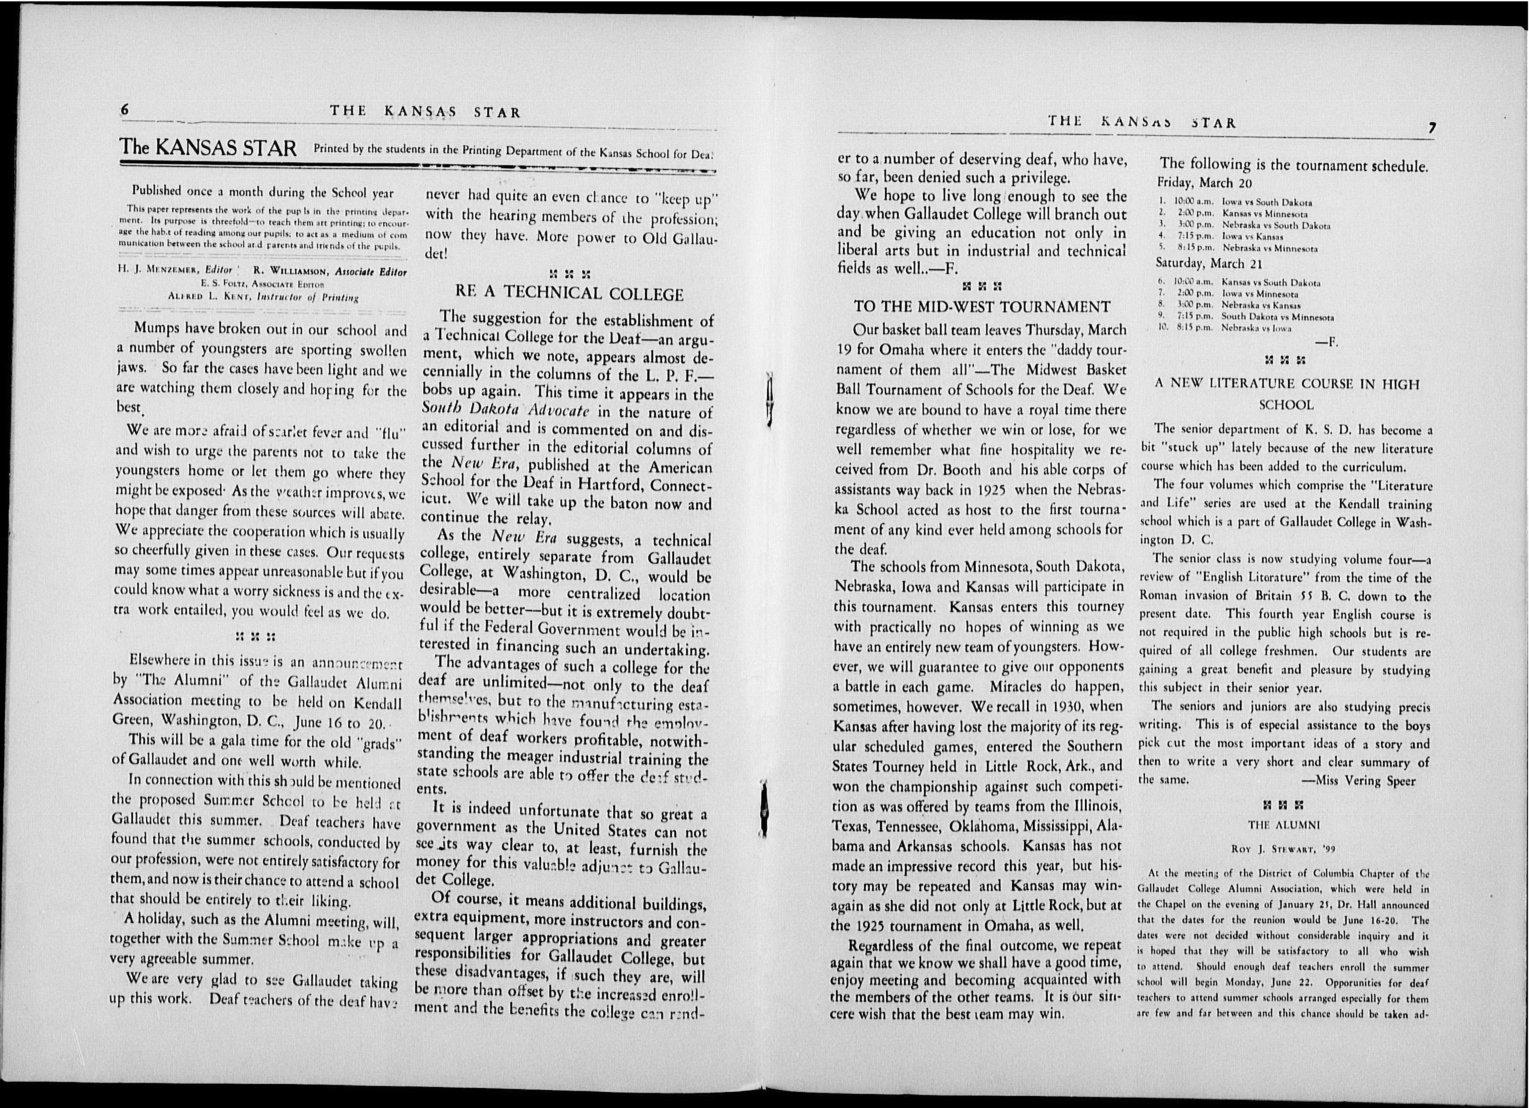 The Kansas Star, volume 50, number 5 - 6-7